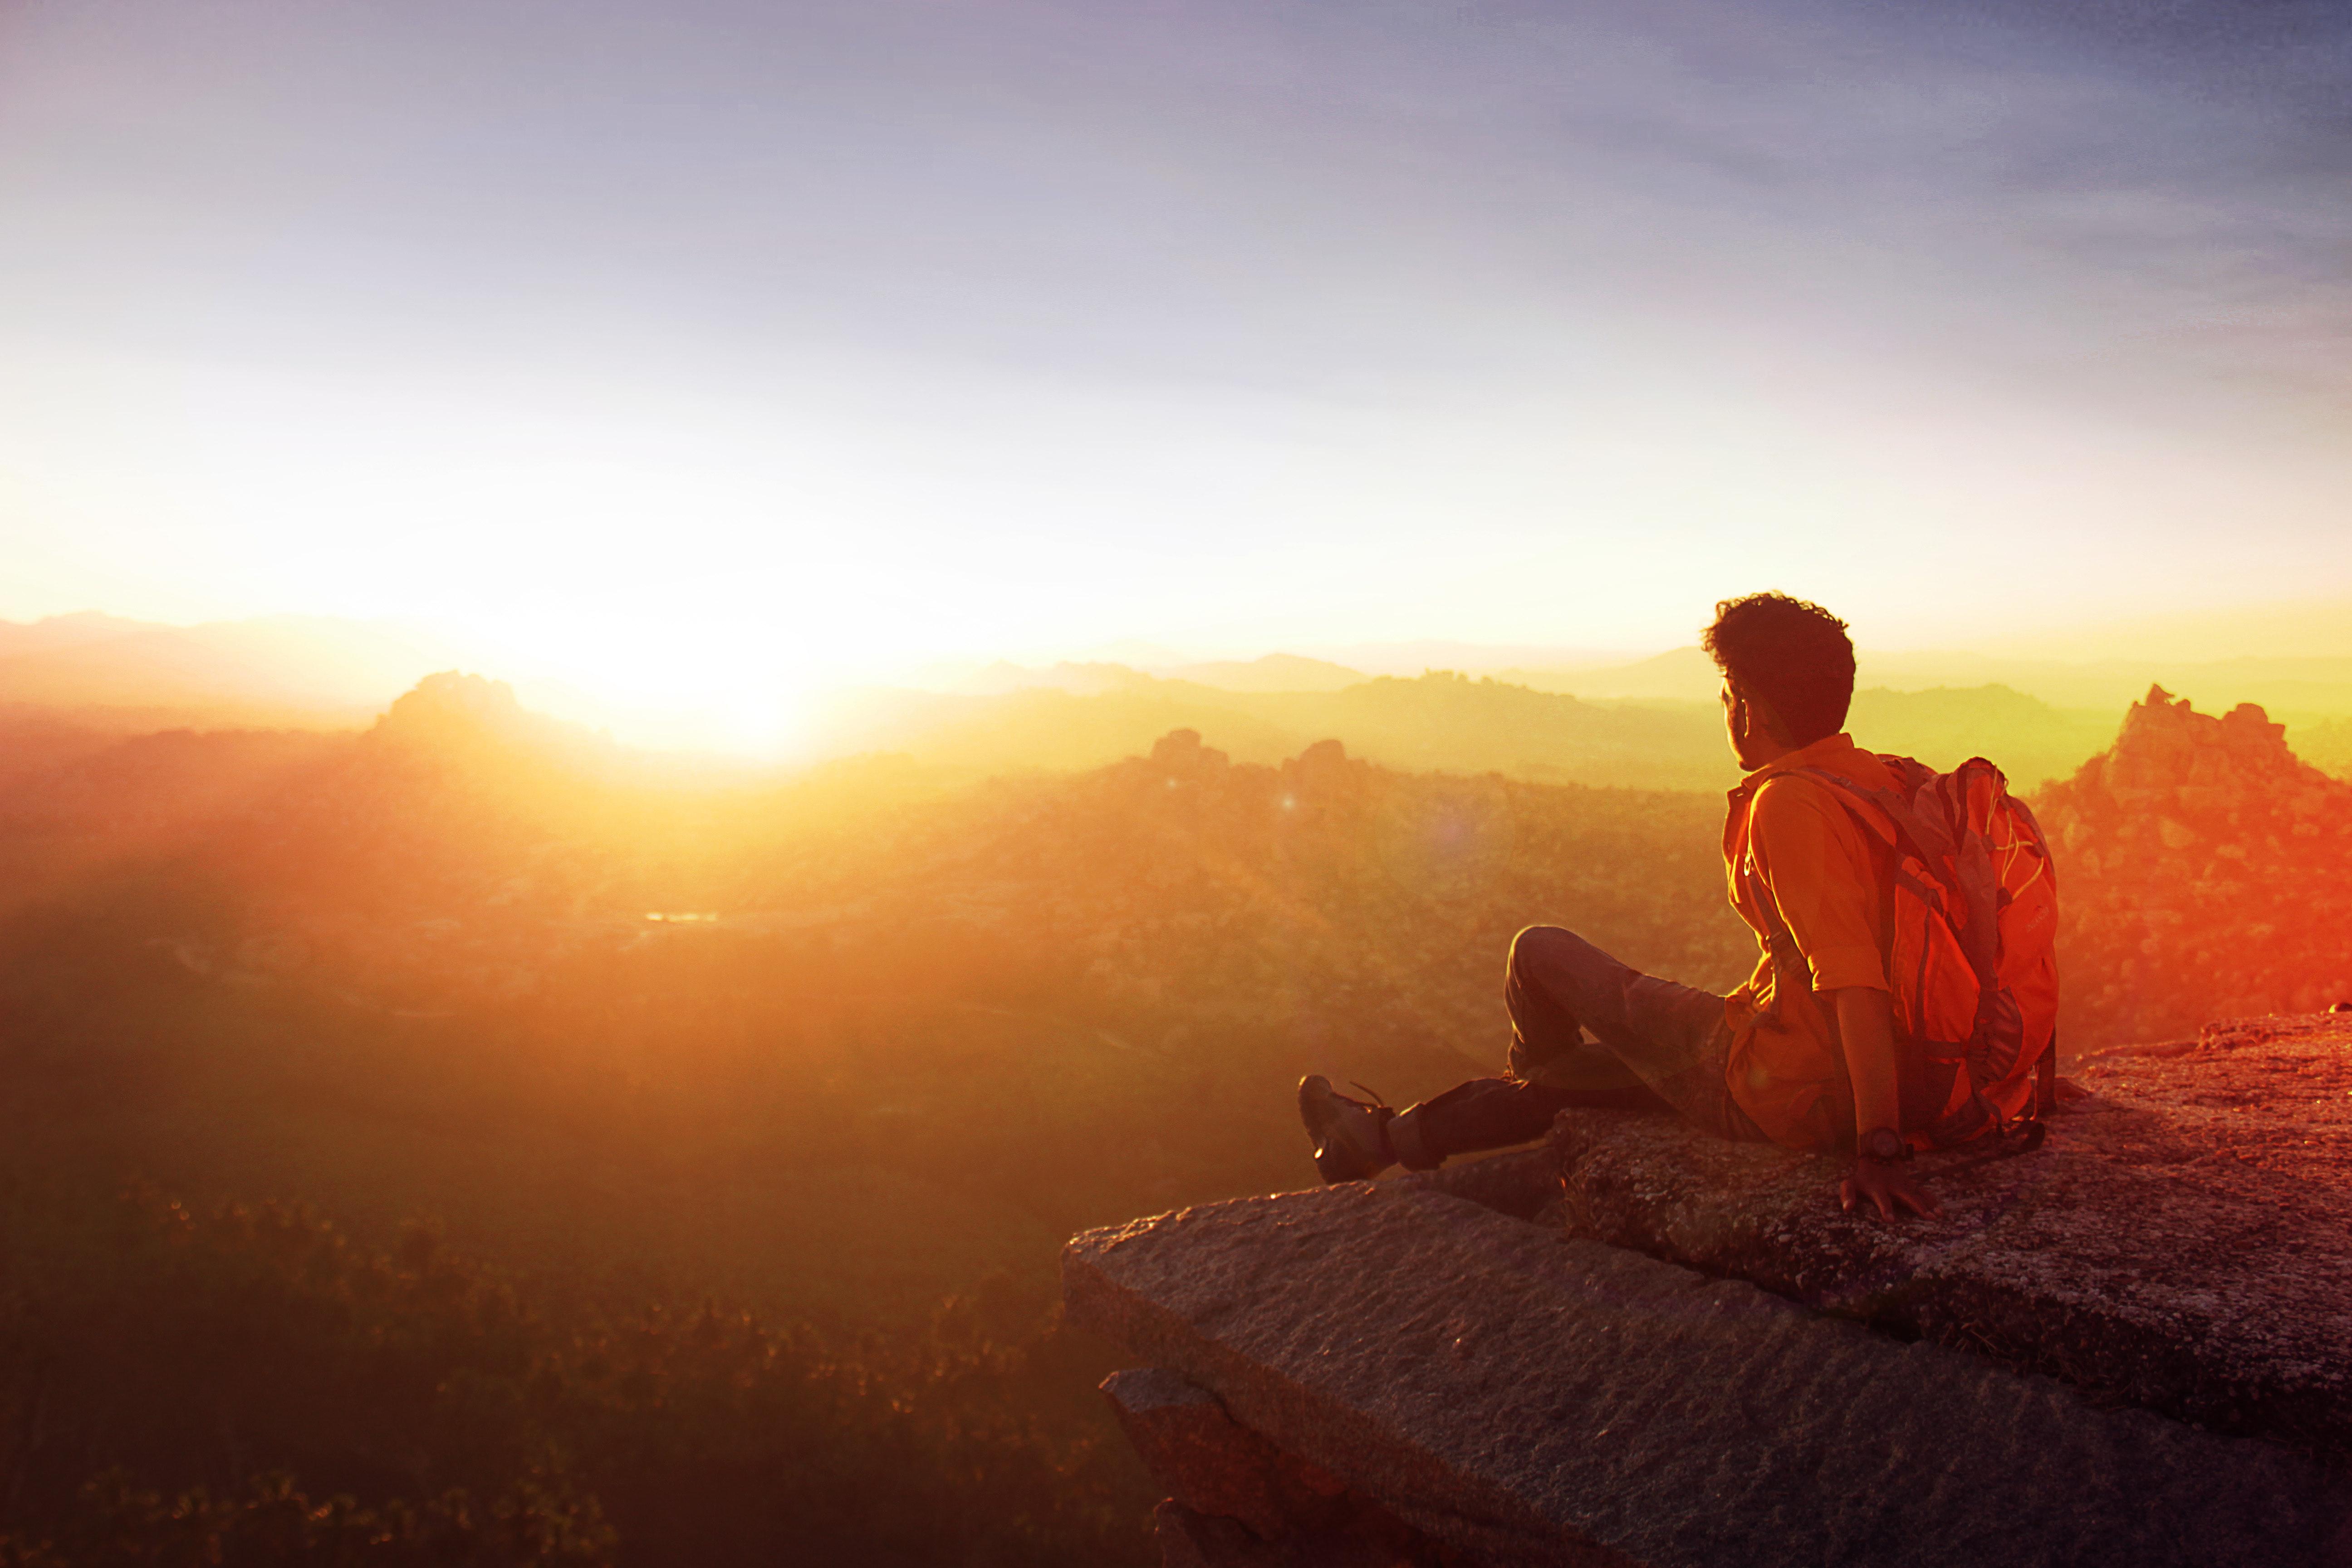 Man sitting on edge facing sunset photo